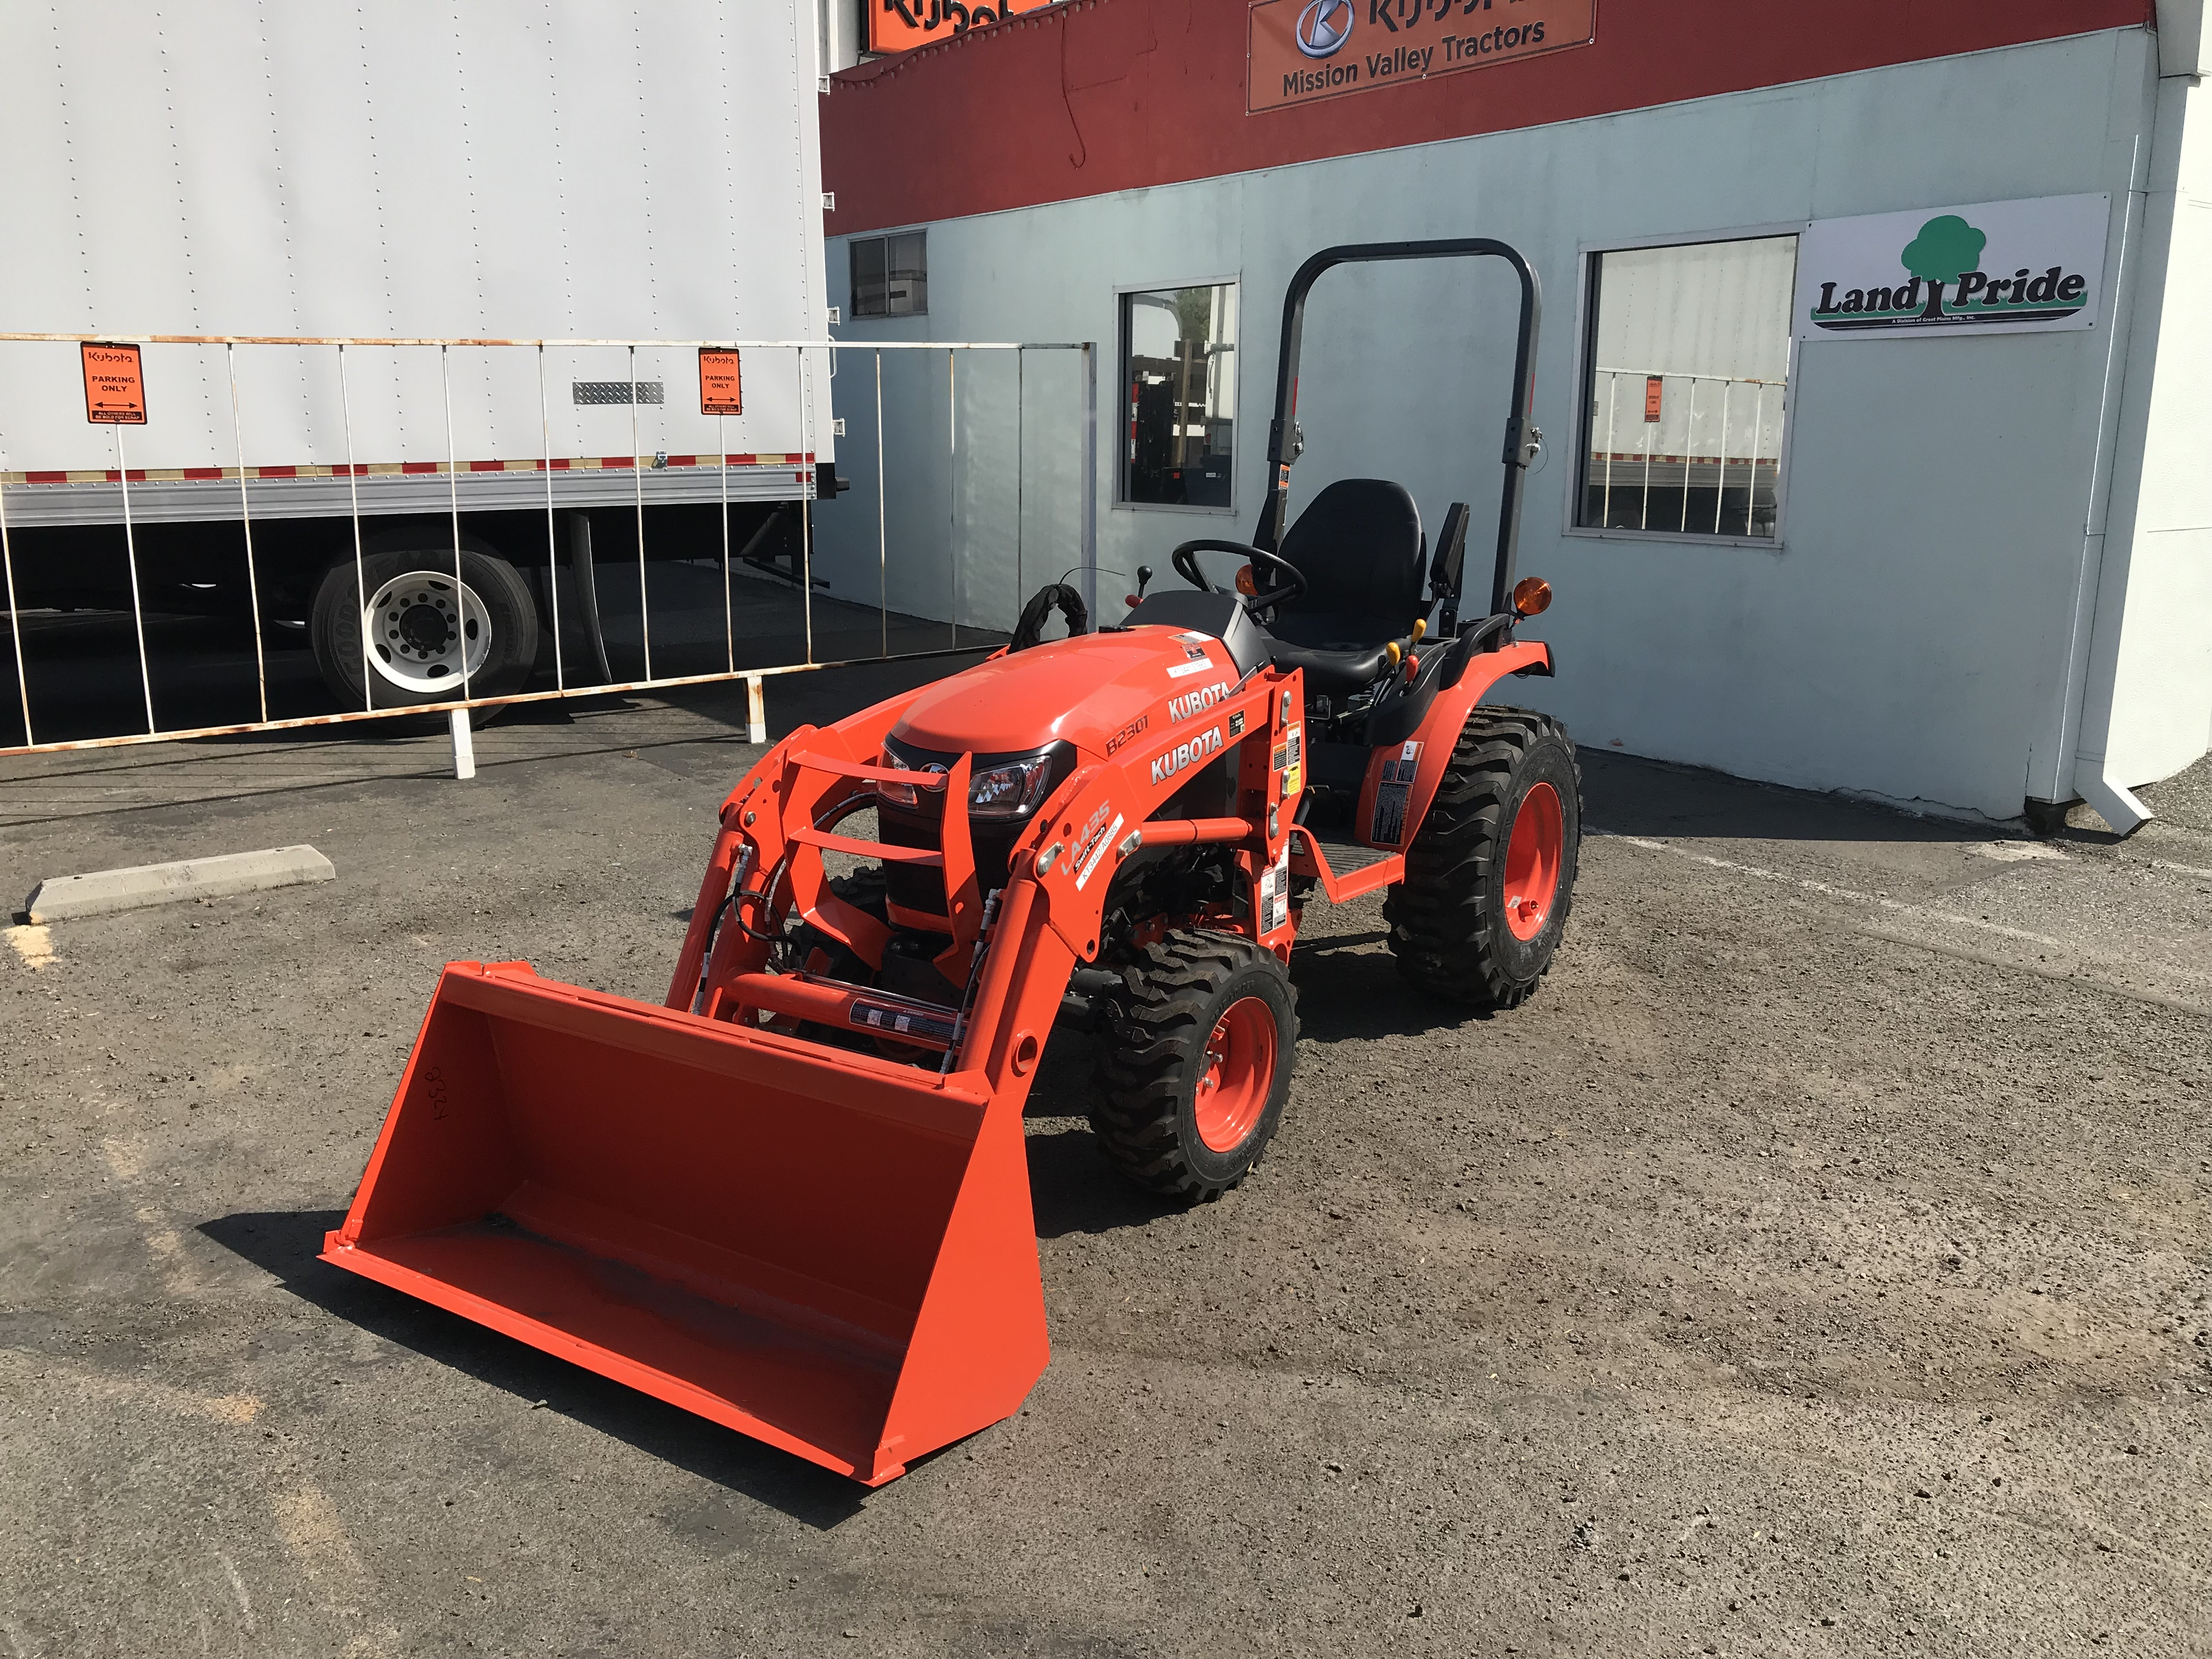 B2301 tractor